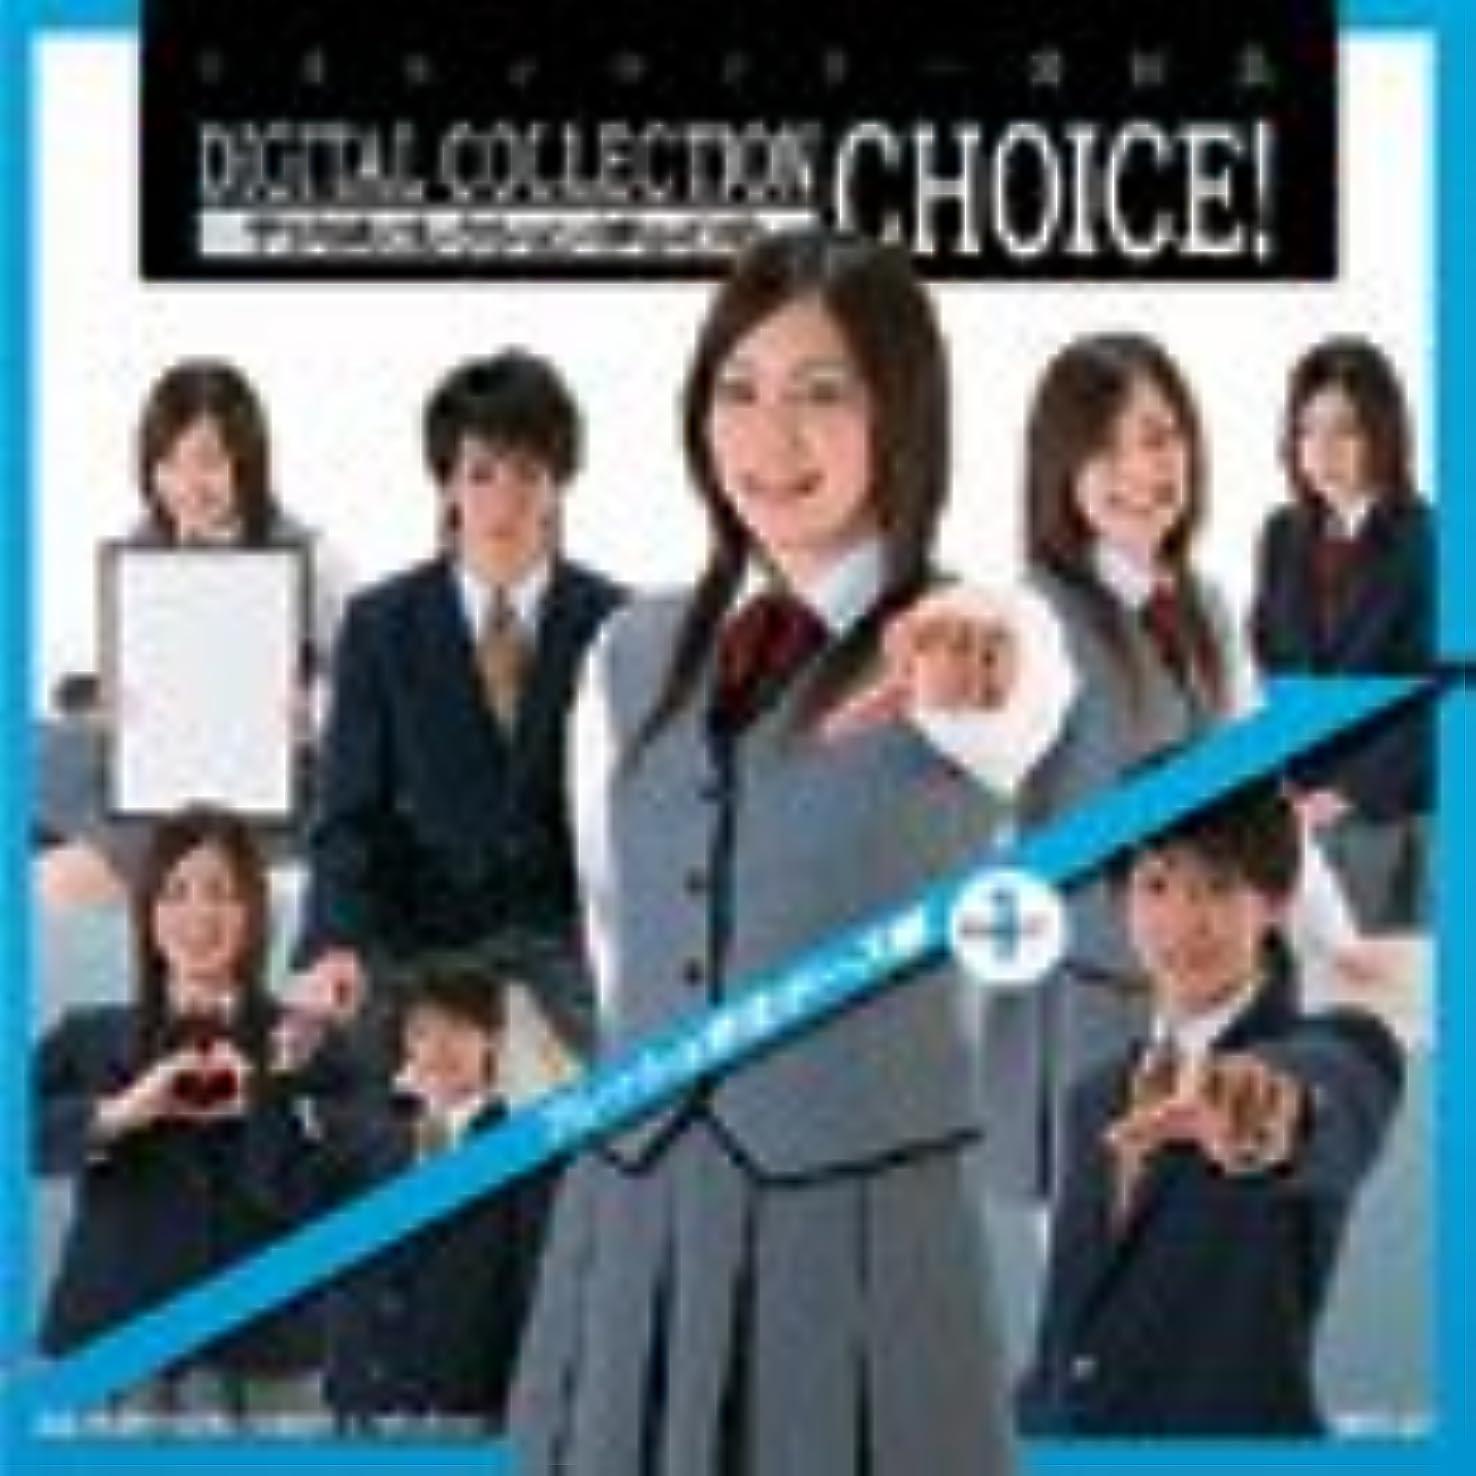 Digital Collection Choice! フレッシュ学生ポーズ編part.1